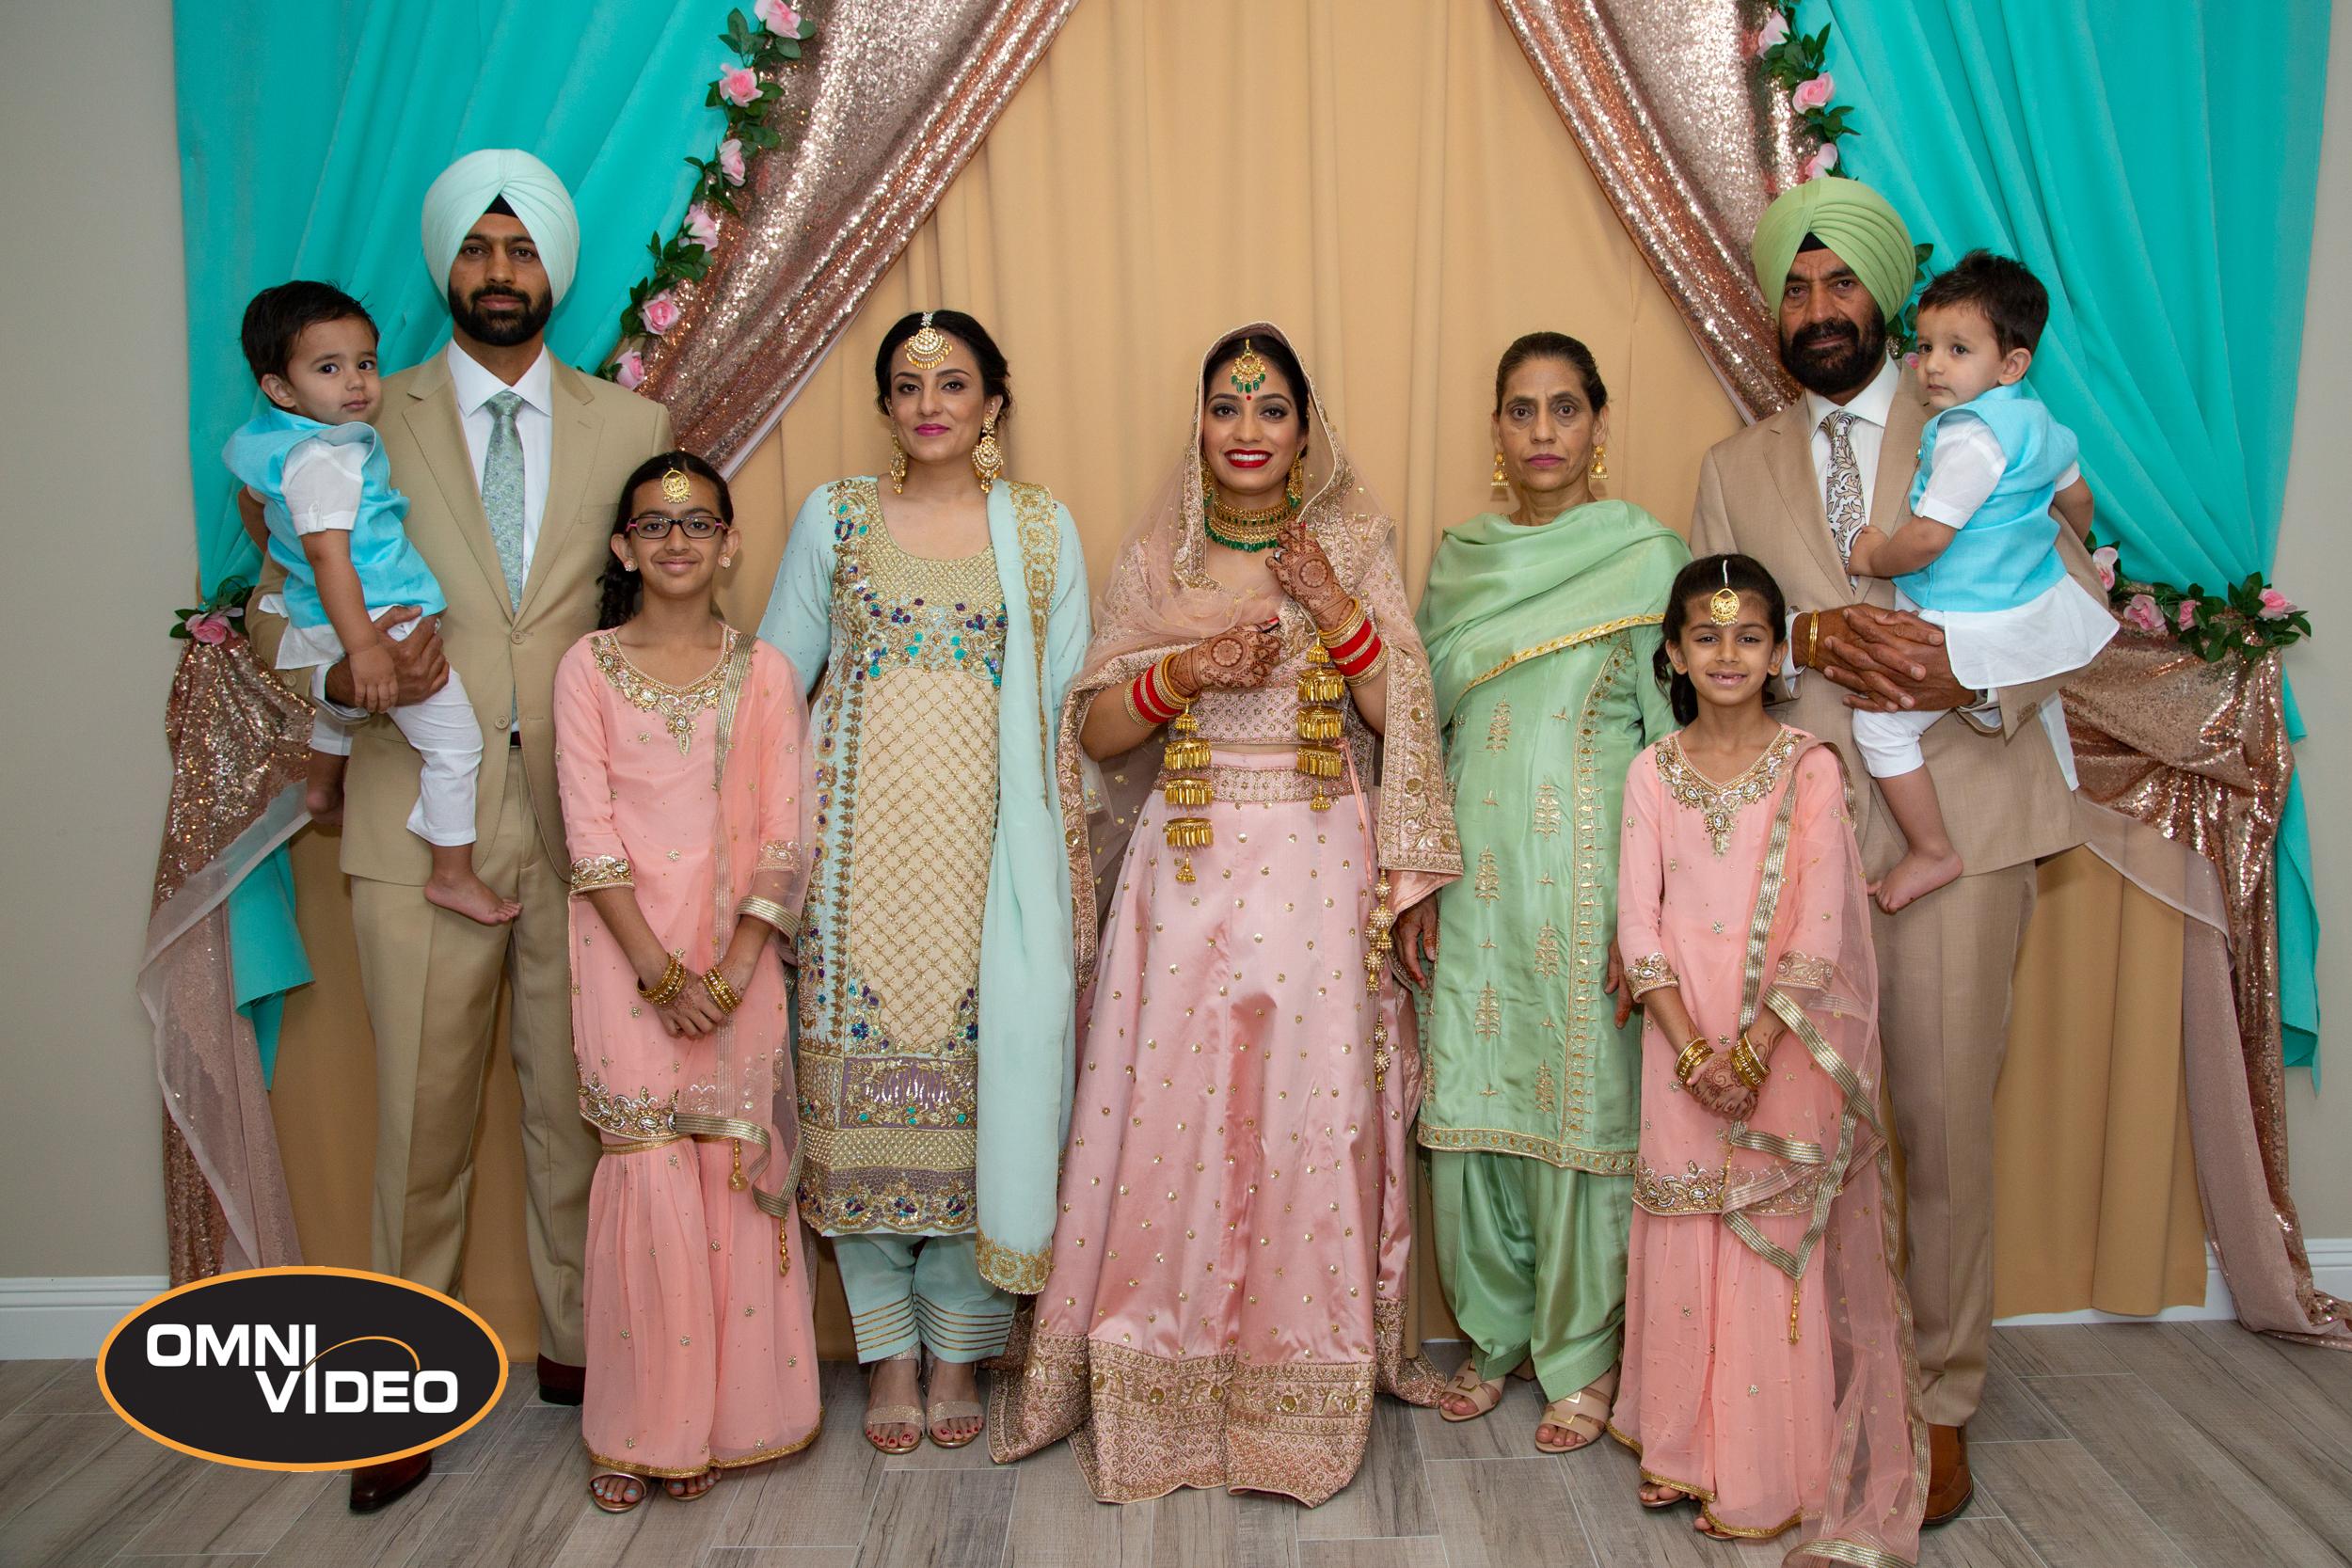 Harmeet & Manjot's Wedding - Omni Video USA